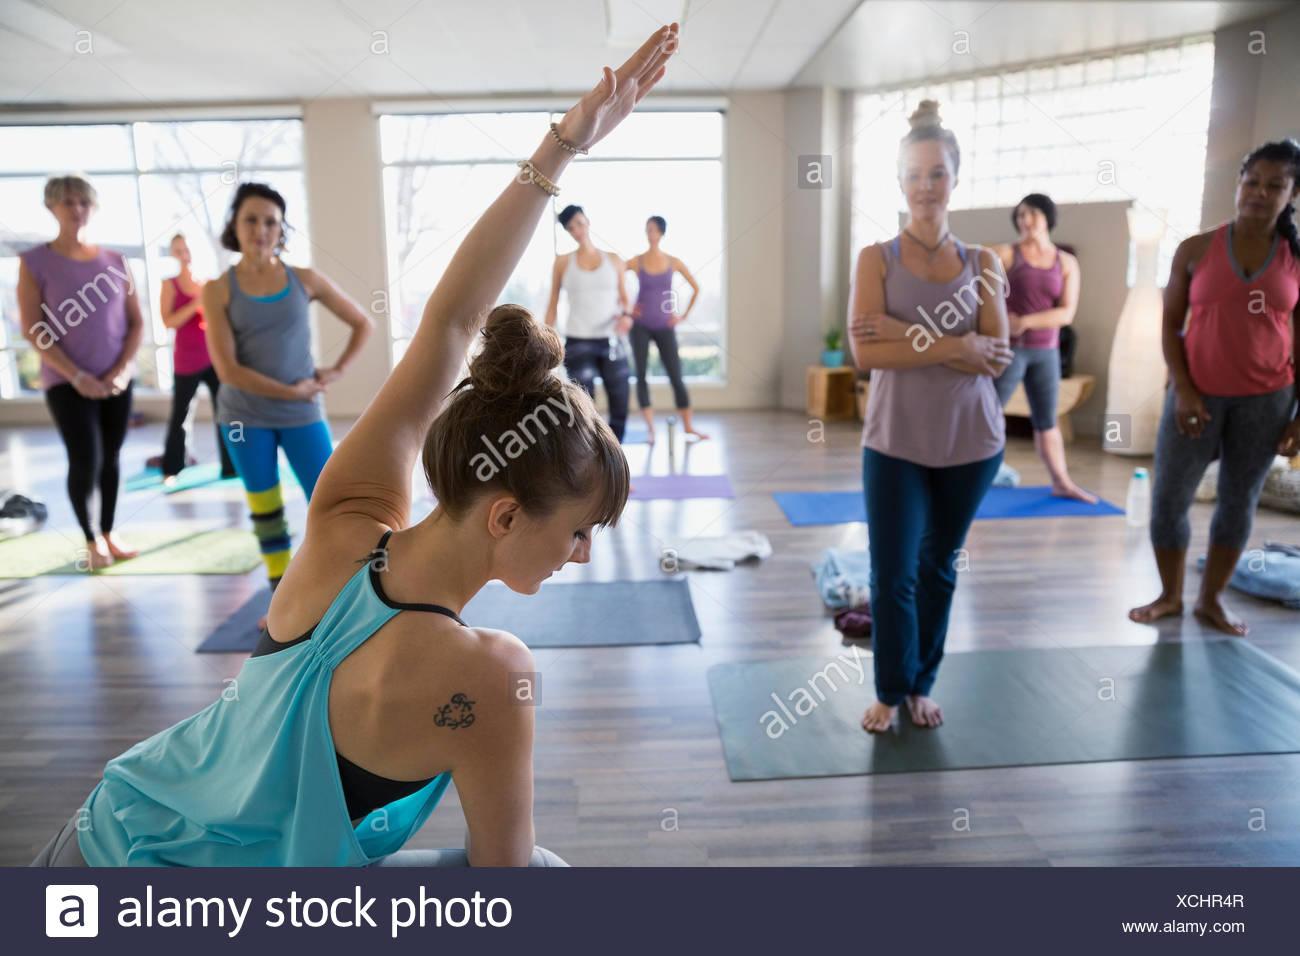 Yoga instructor demonstrating modified side angle pose - Stock Image